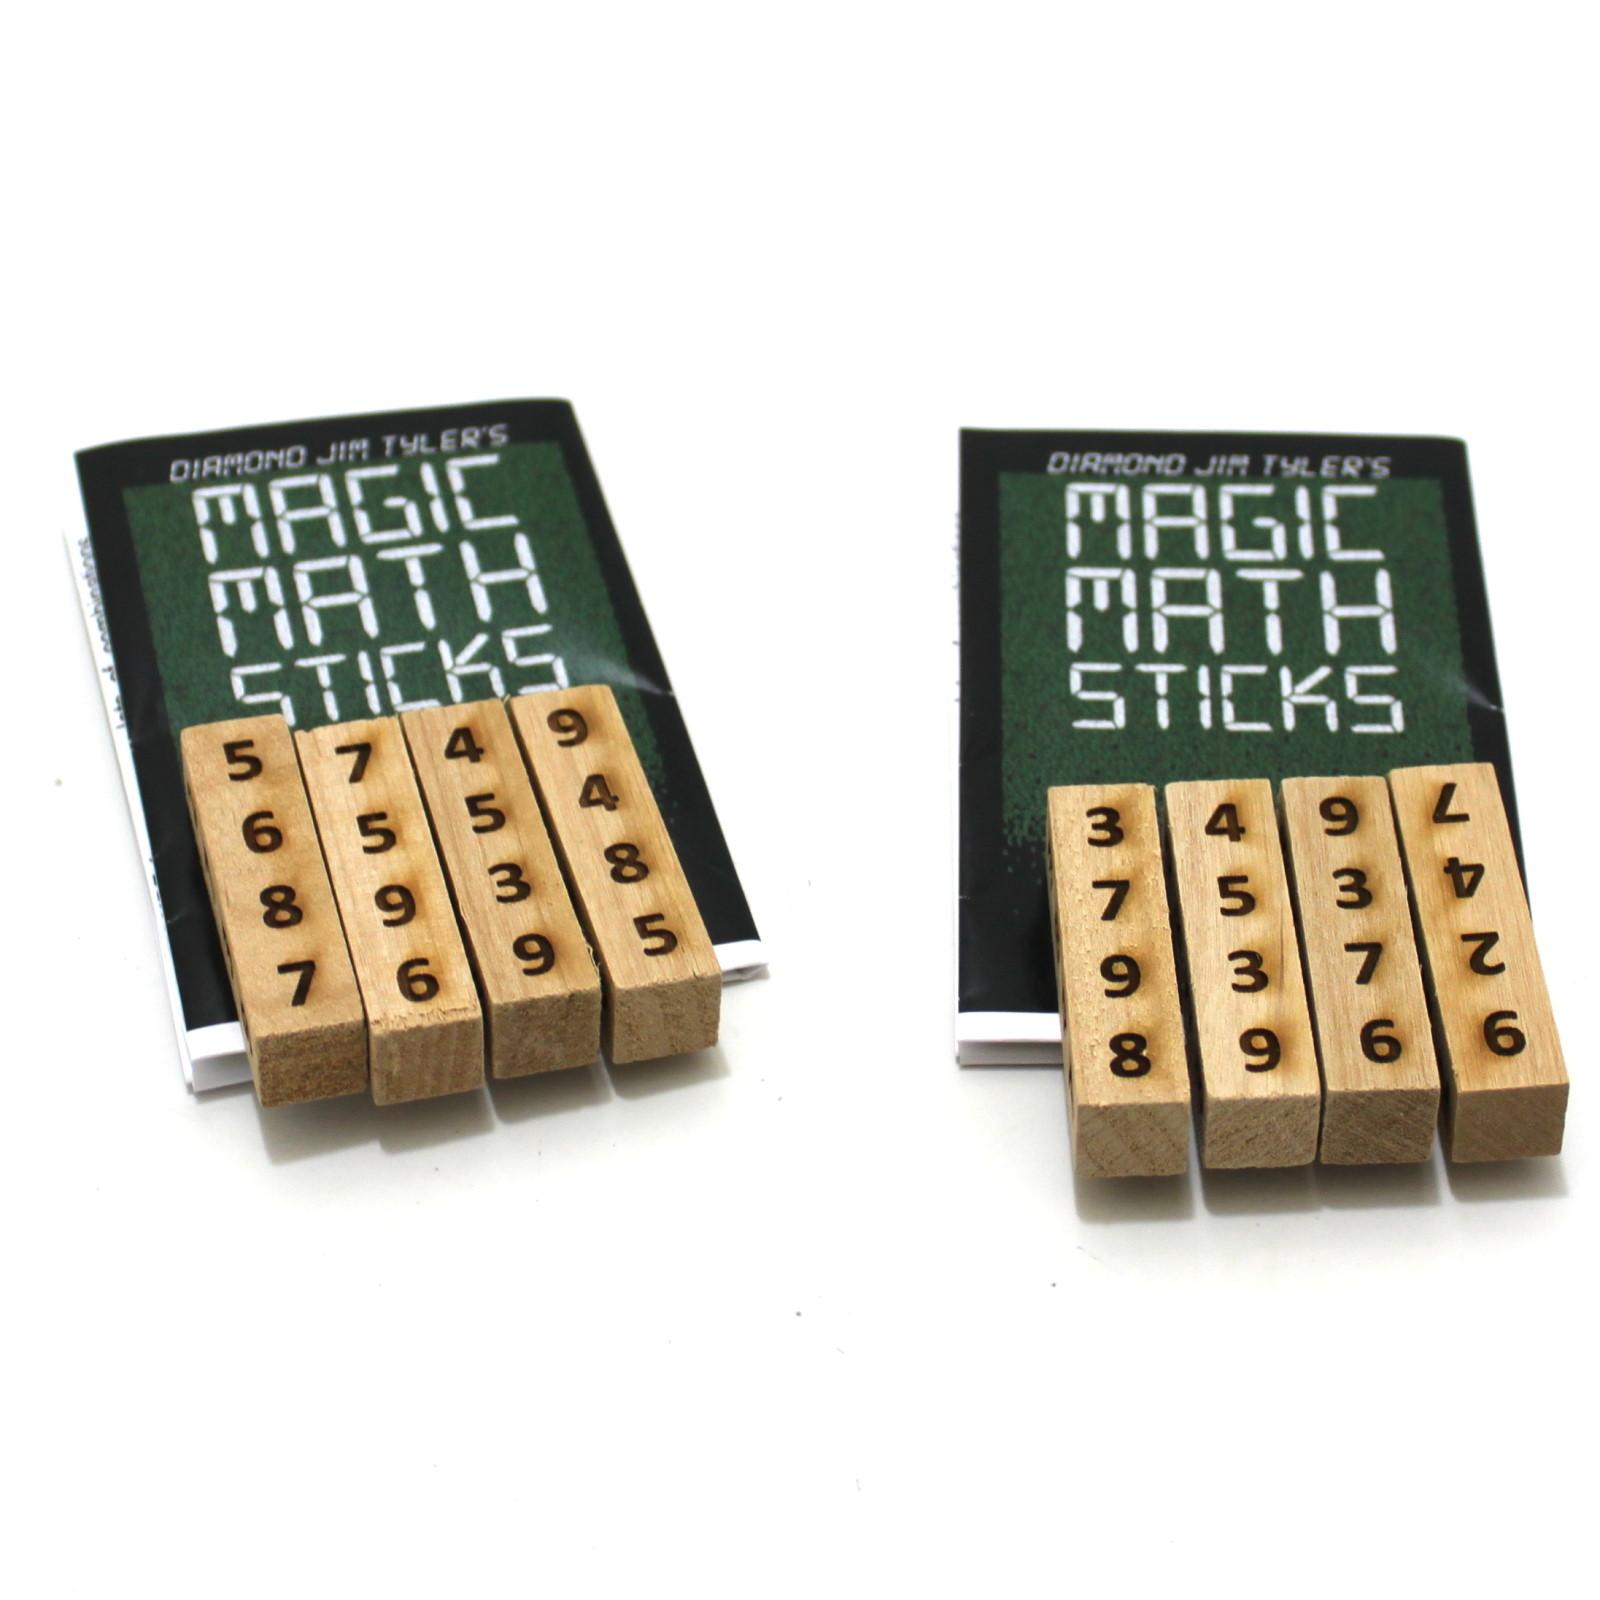 Magic Math Sticks by Diamond Jim Tyler